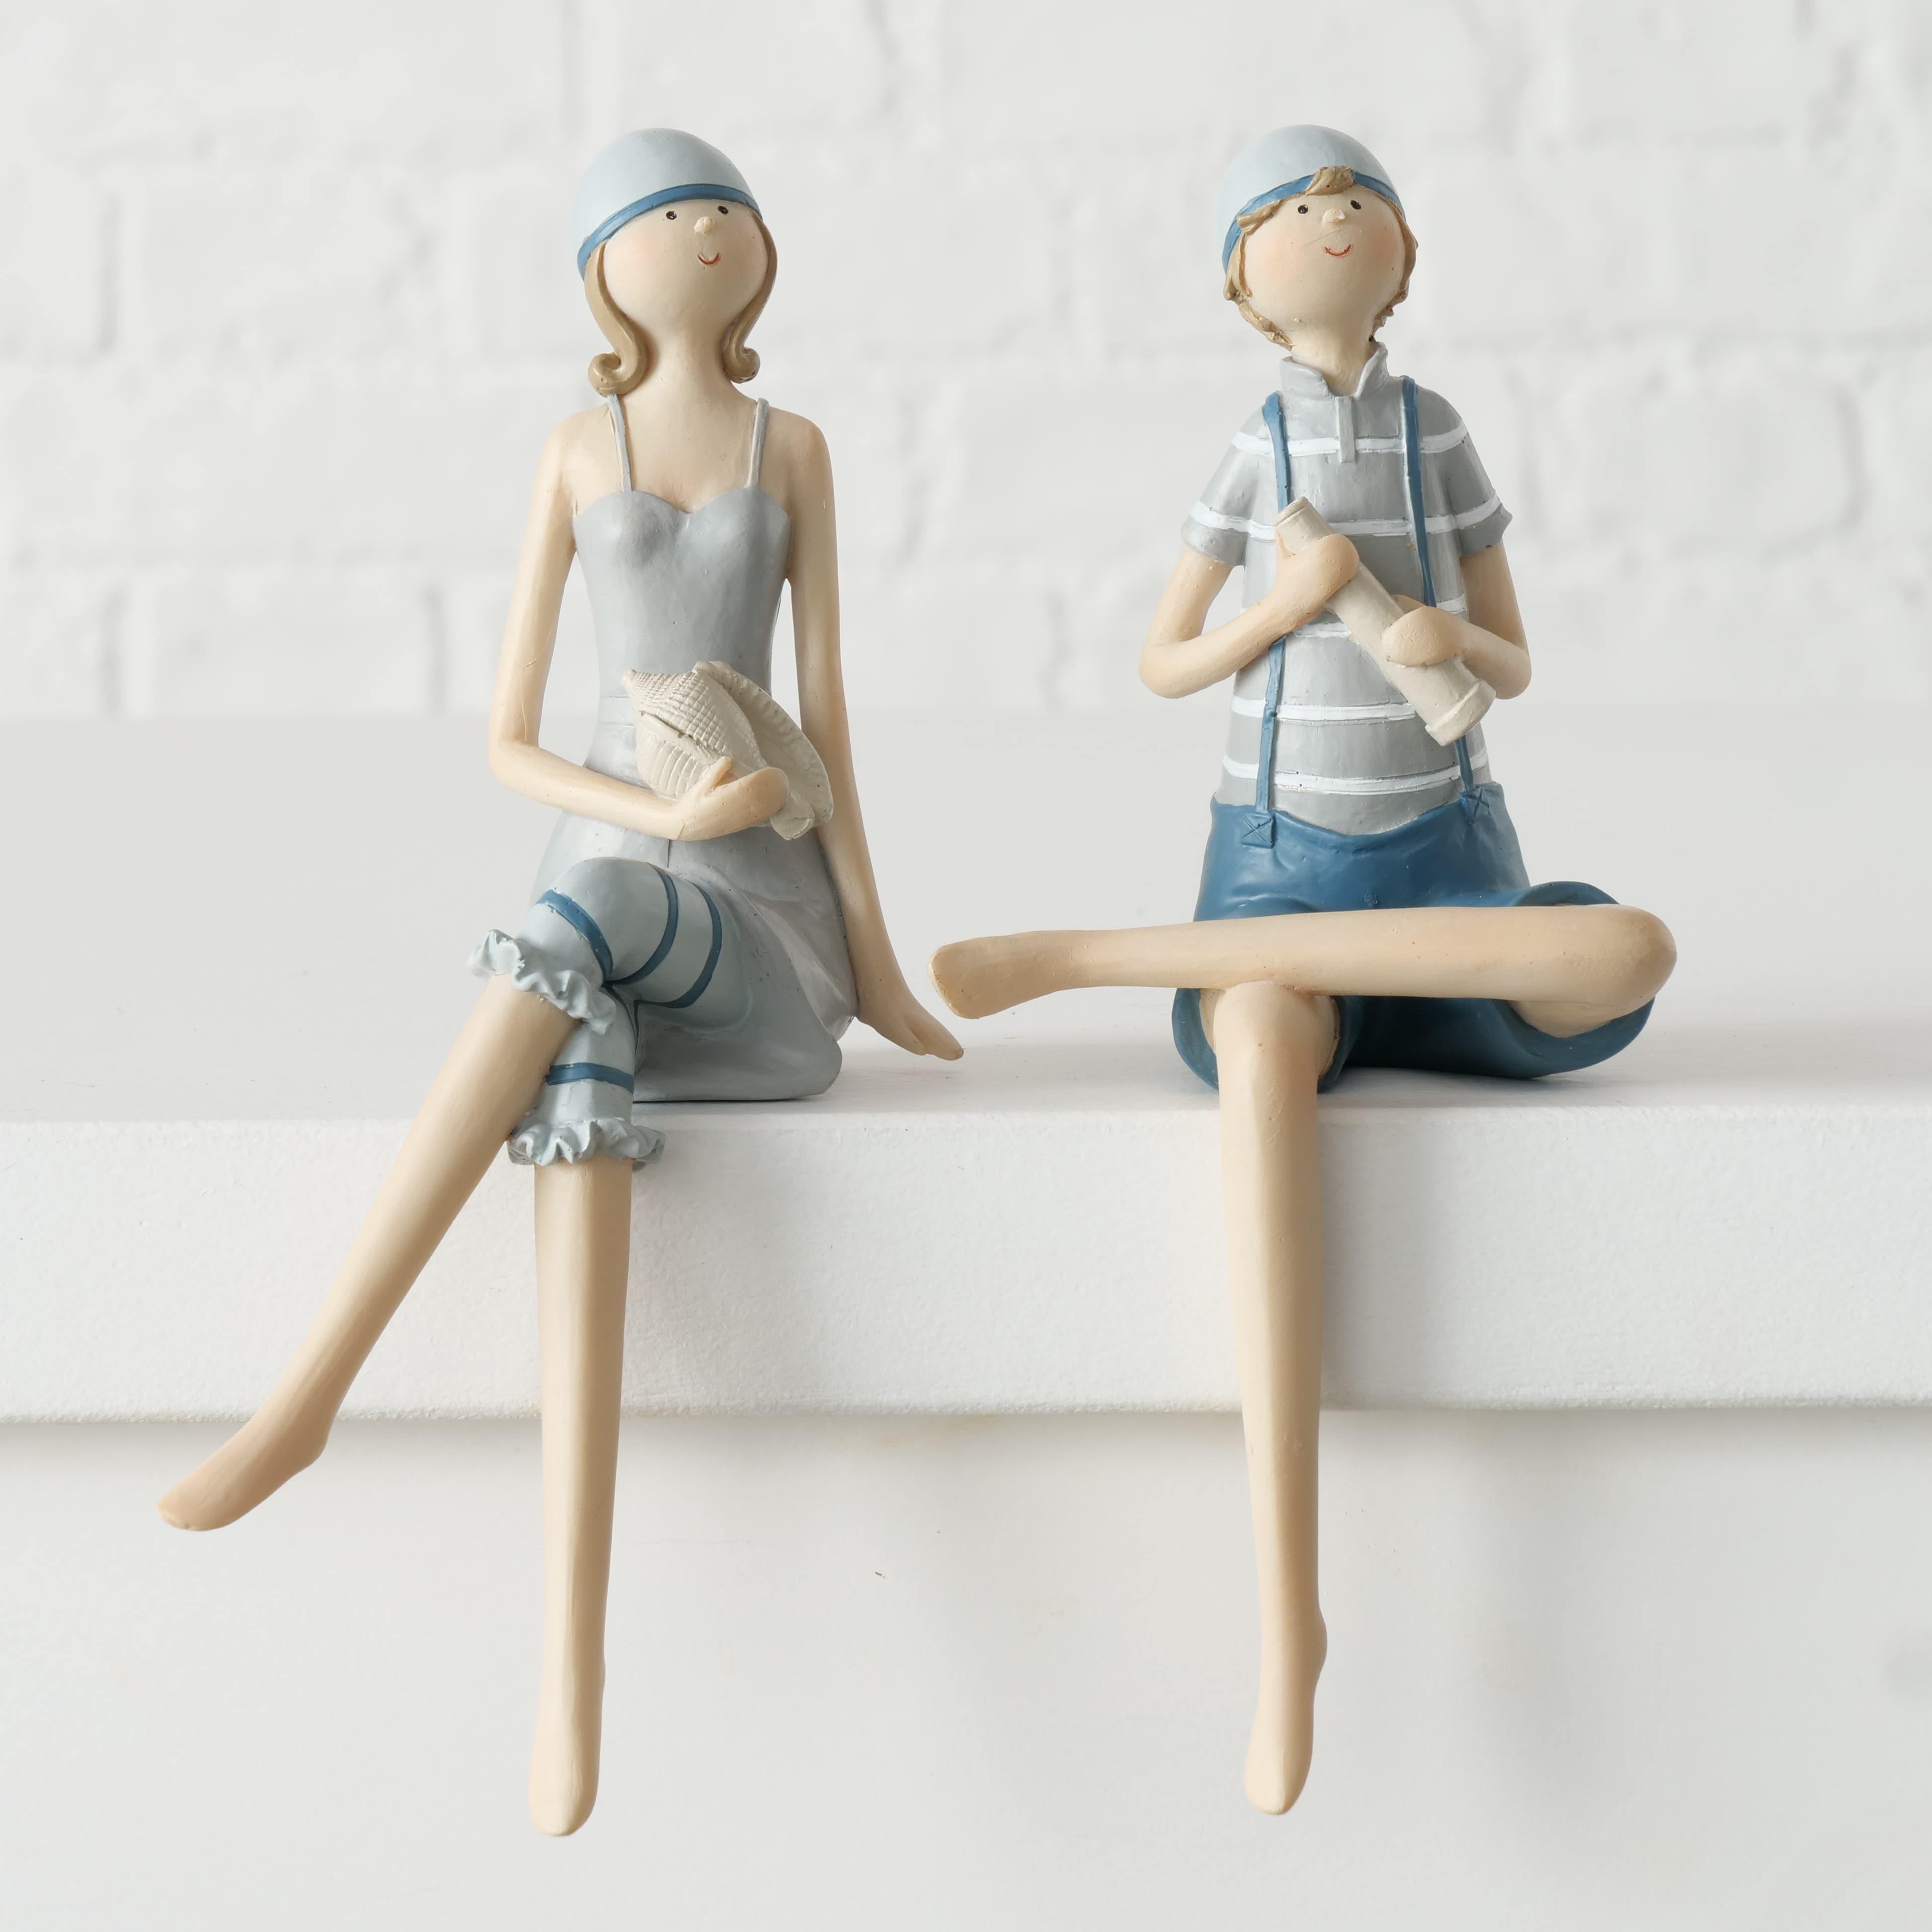 Figurina decorativa din polirasina Lexy Multicolor, Modele Asortate, l9xA9xH20 cm poza